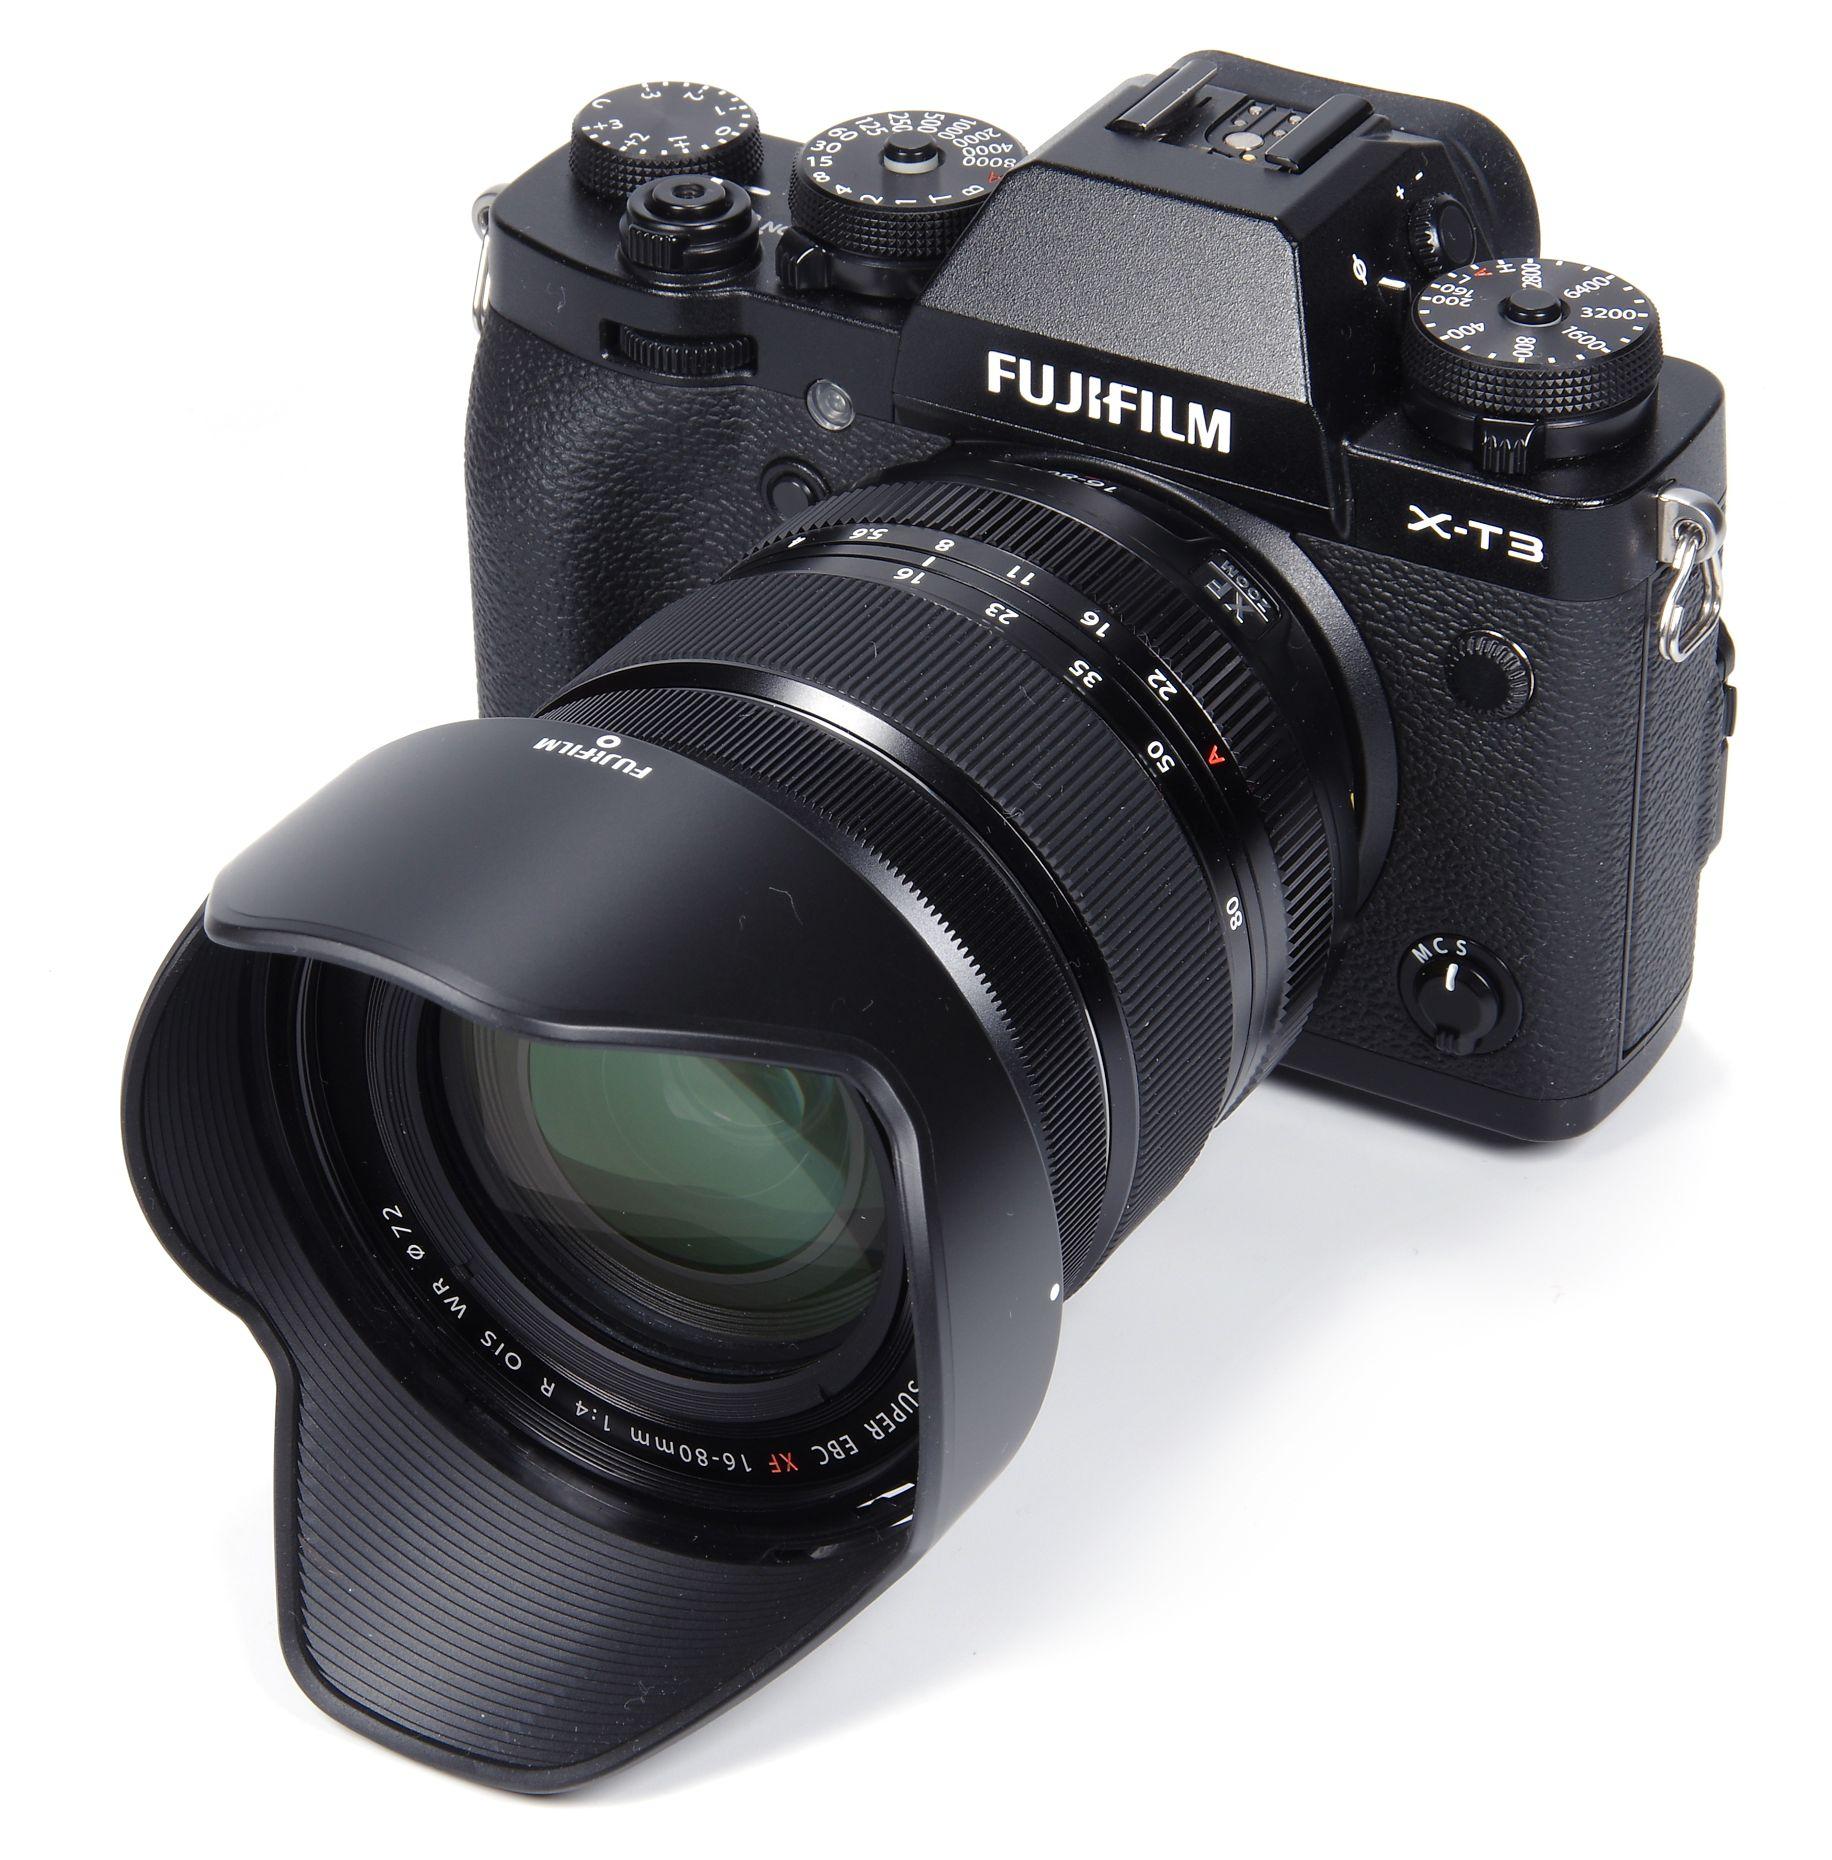 Appareil Photo hybride Fujifilm X-T4 Noir + Objectif XF 16-80mm F4 R OIS WR